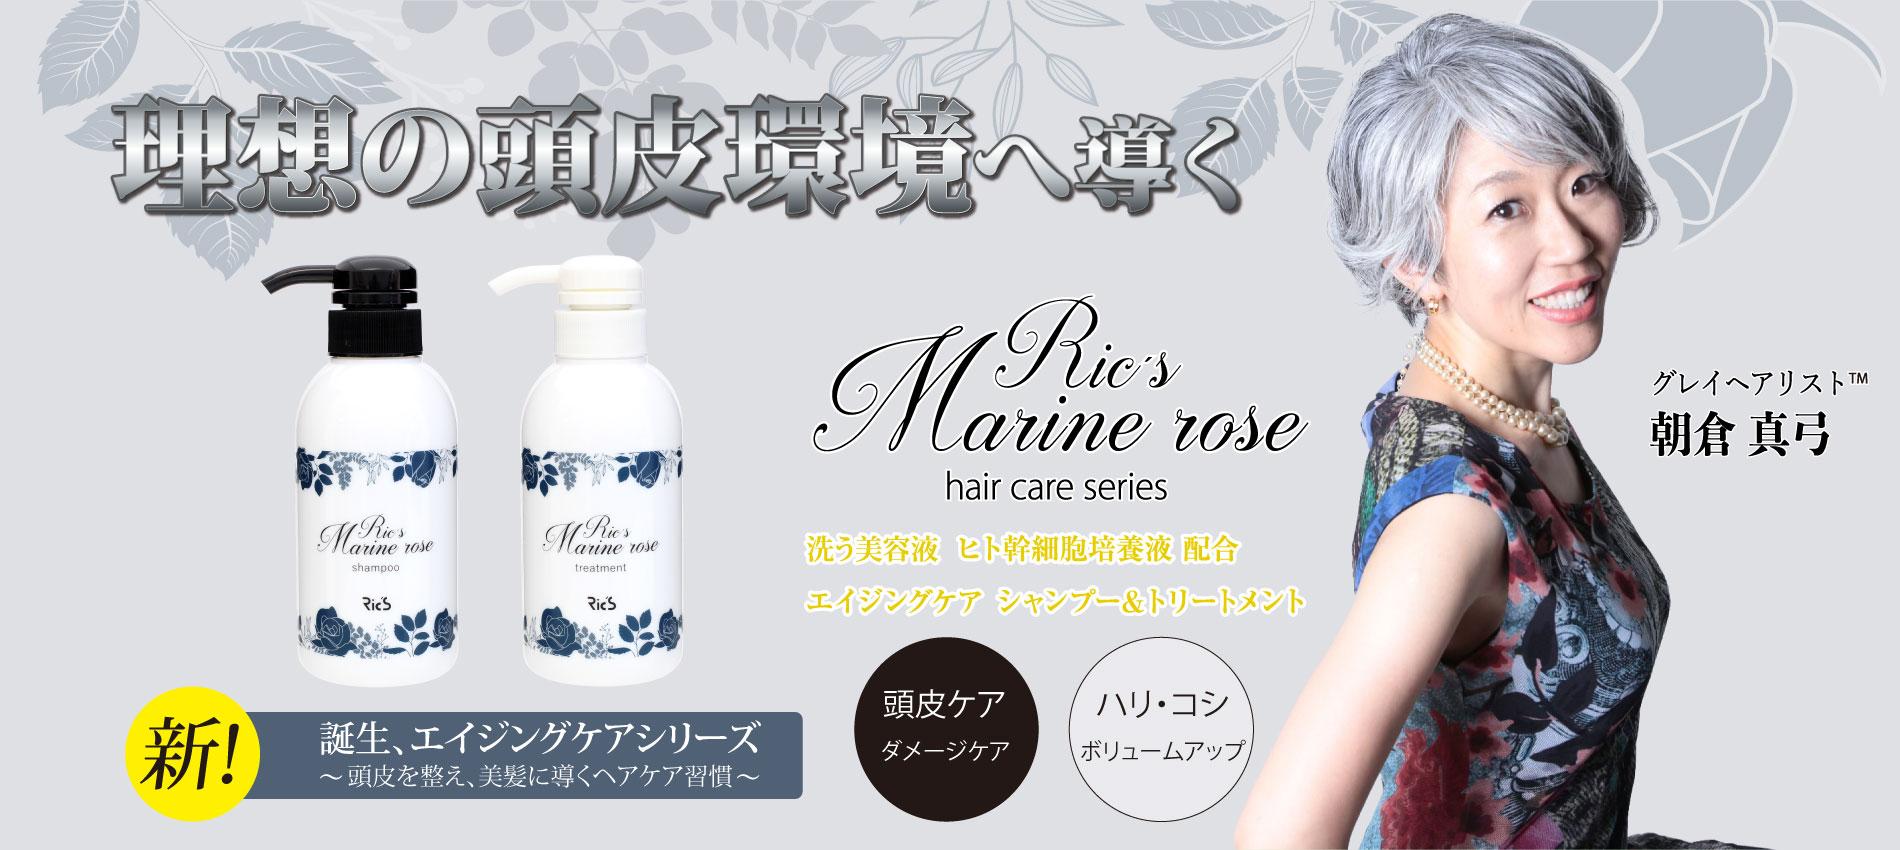 Scalp Sherbets Marine rose shampoo&treatment